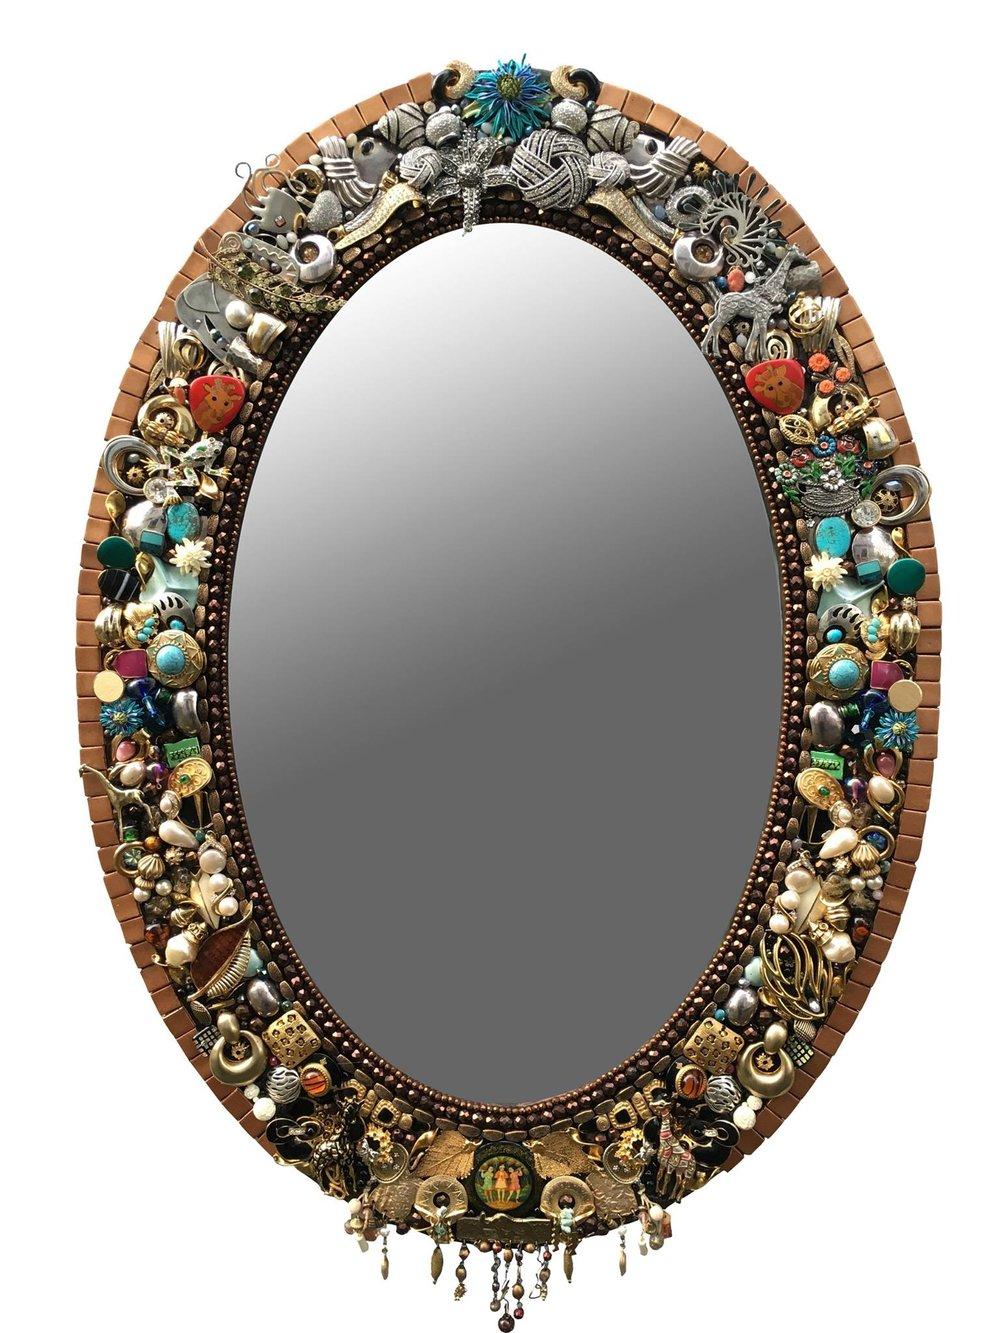 JewelryMirror2.jpg